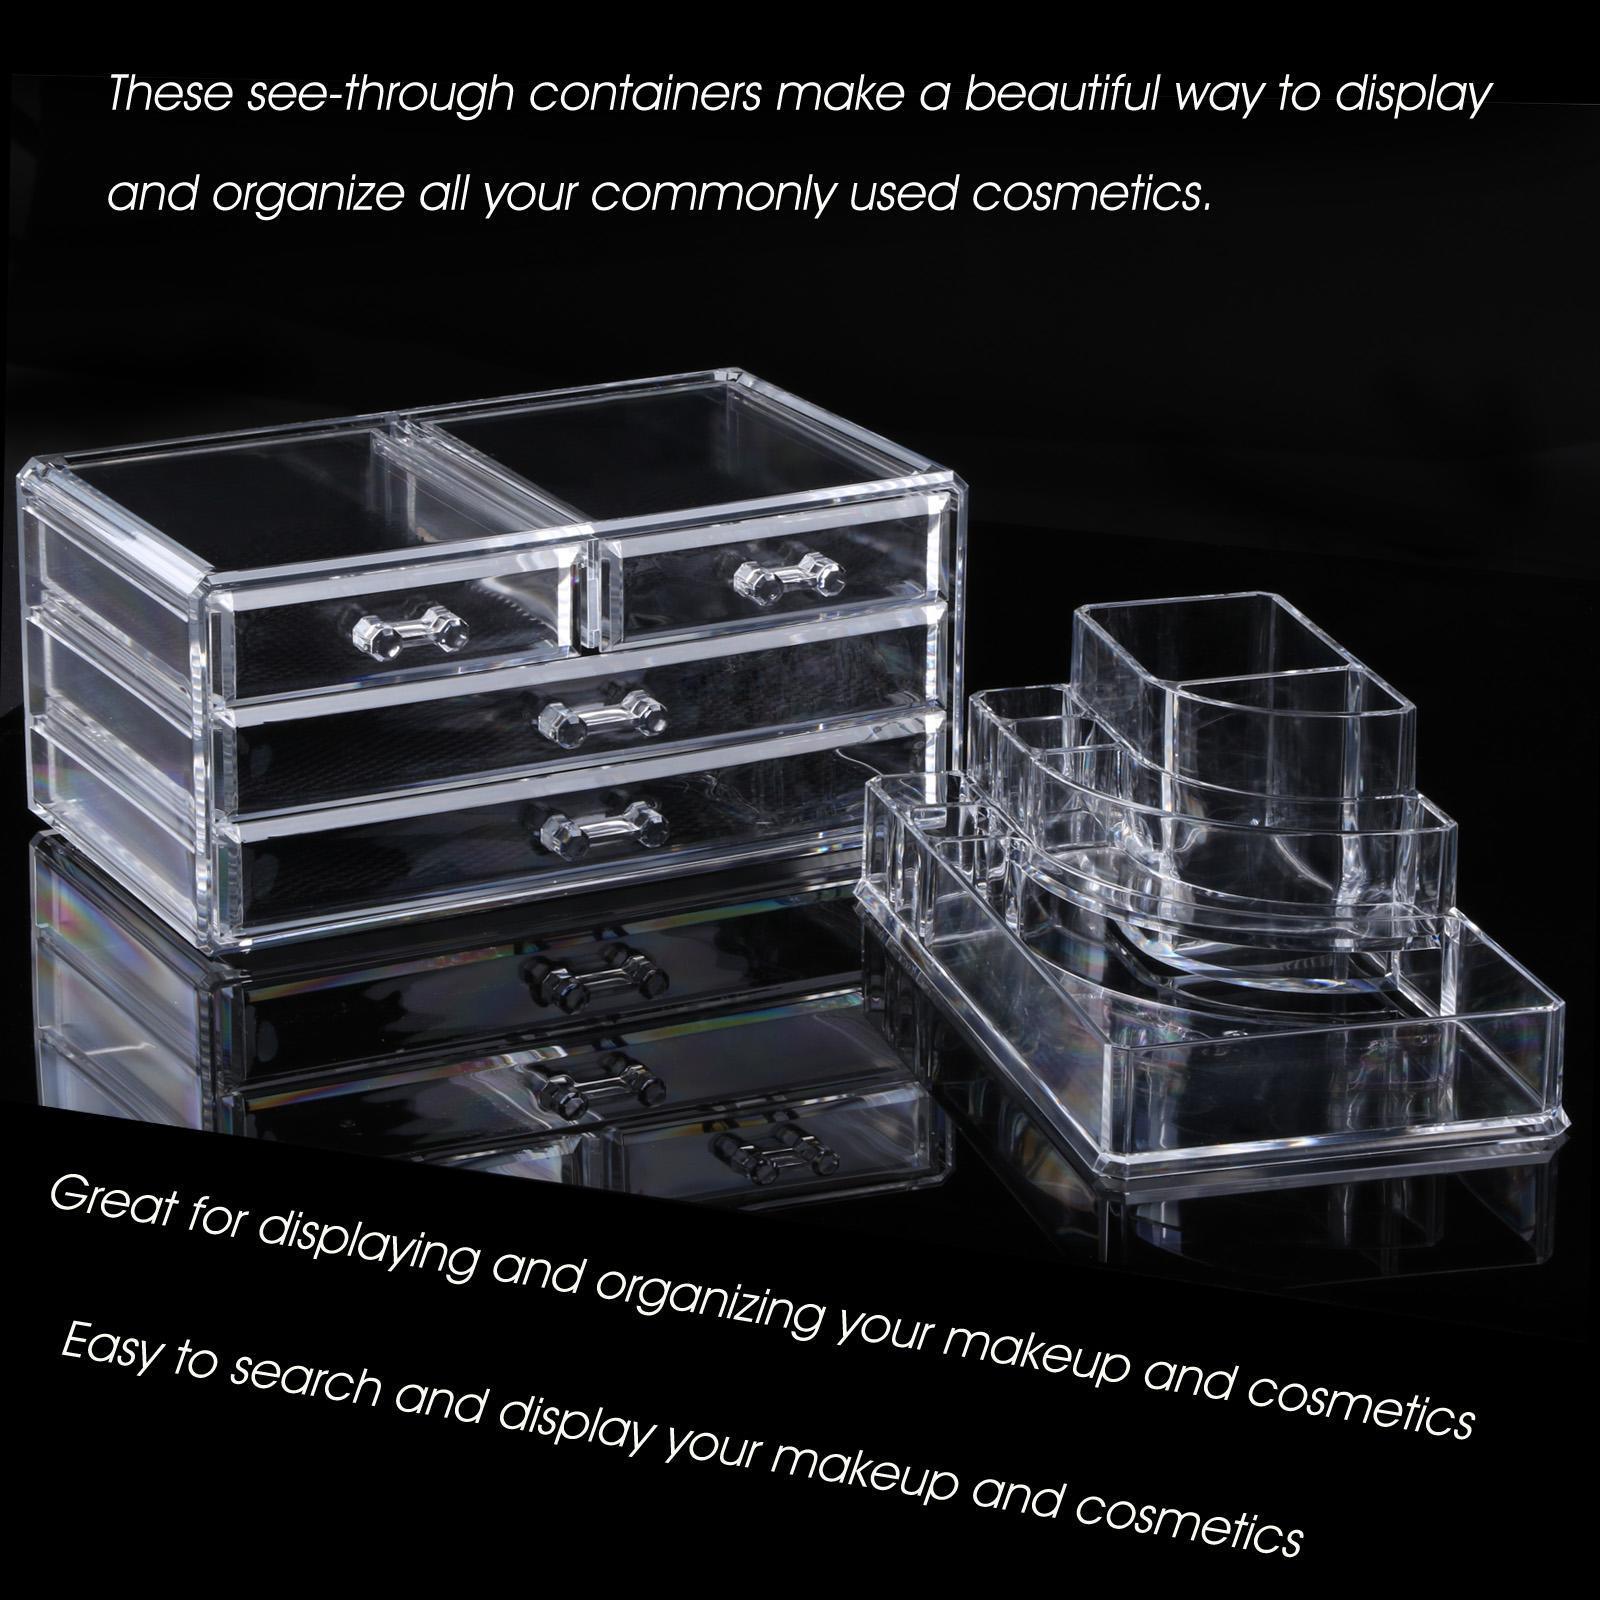 Acrylic Makeup Drawers Grids 3 Tiers Display 1